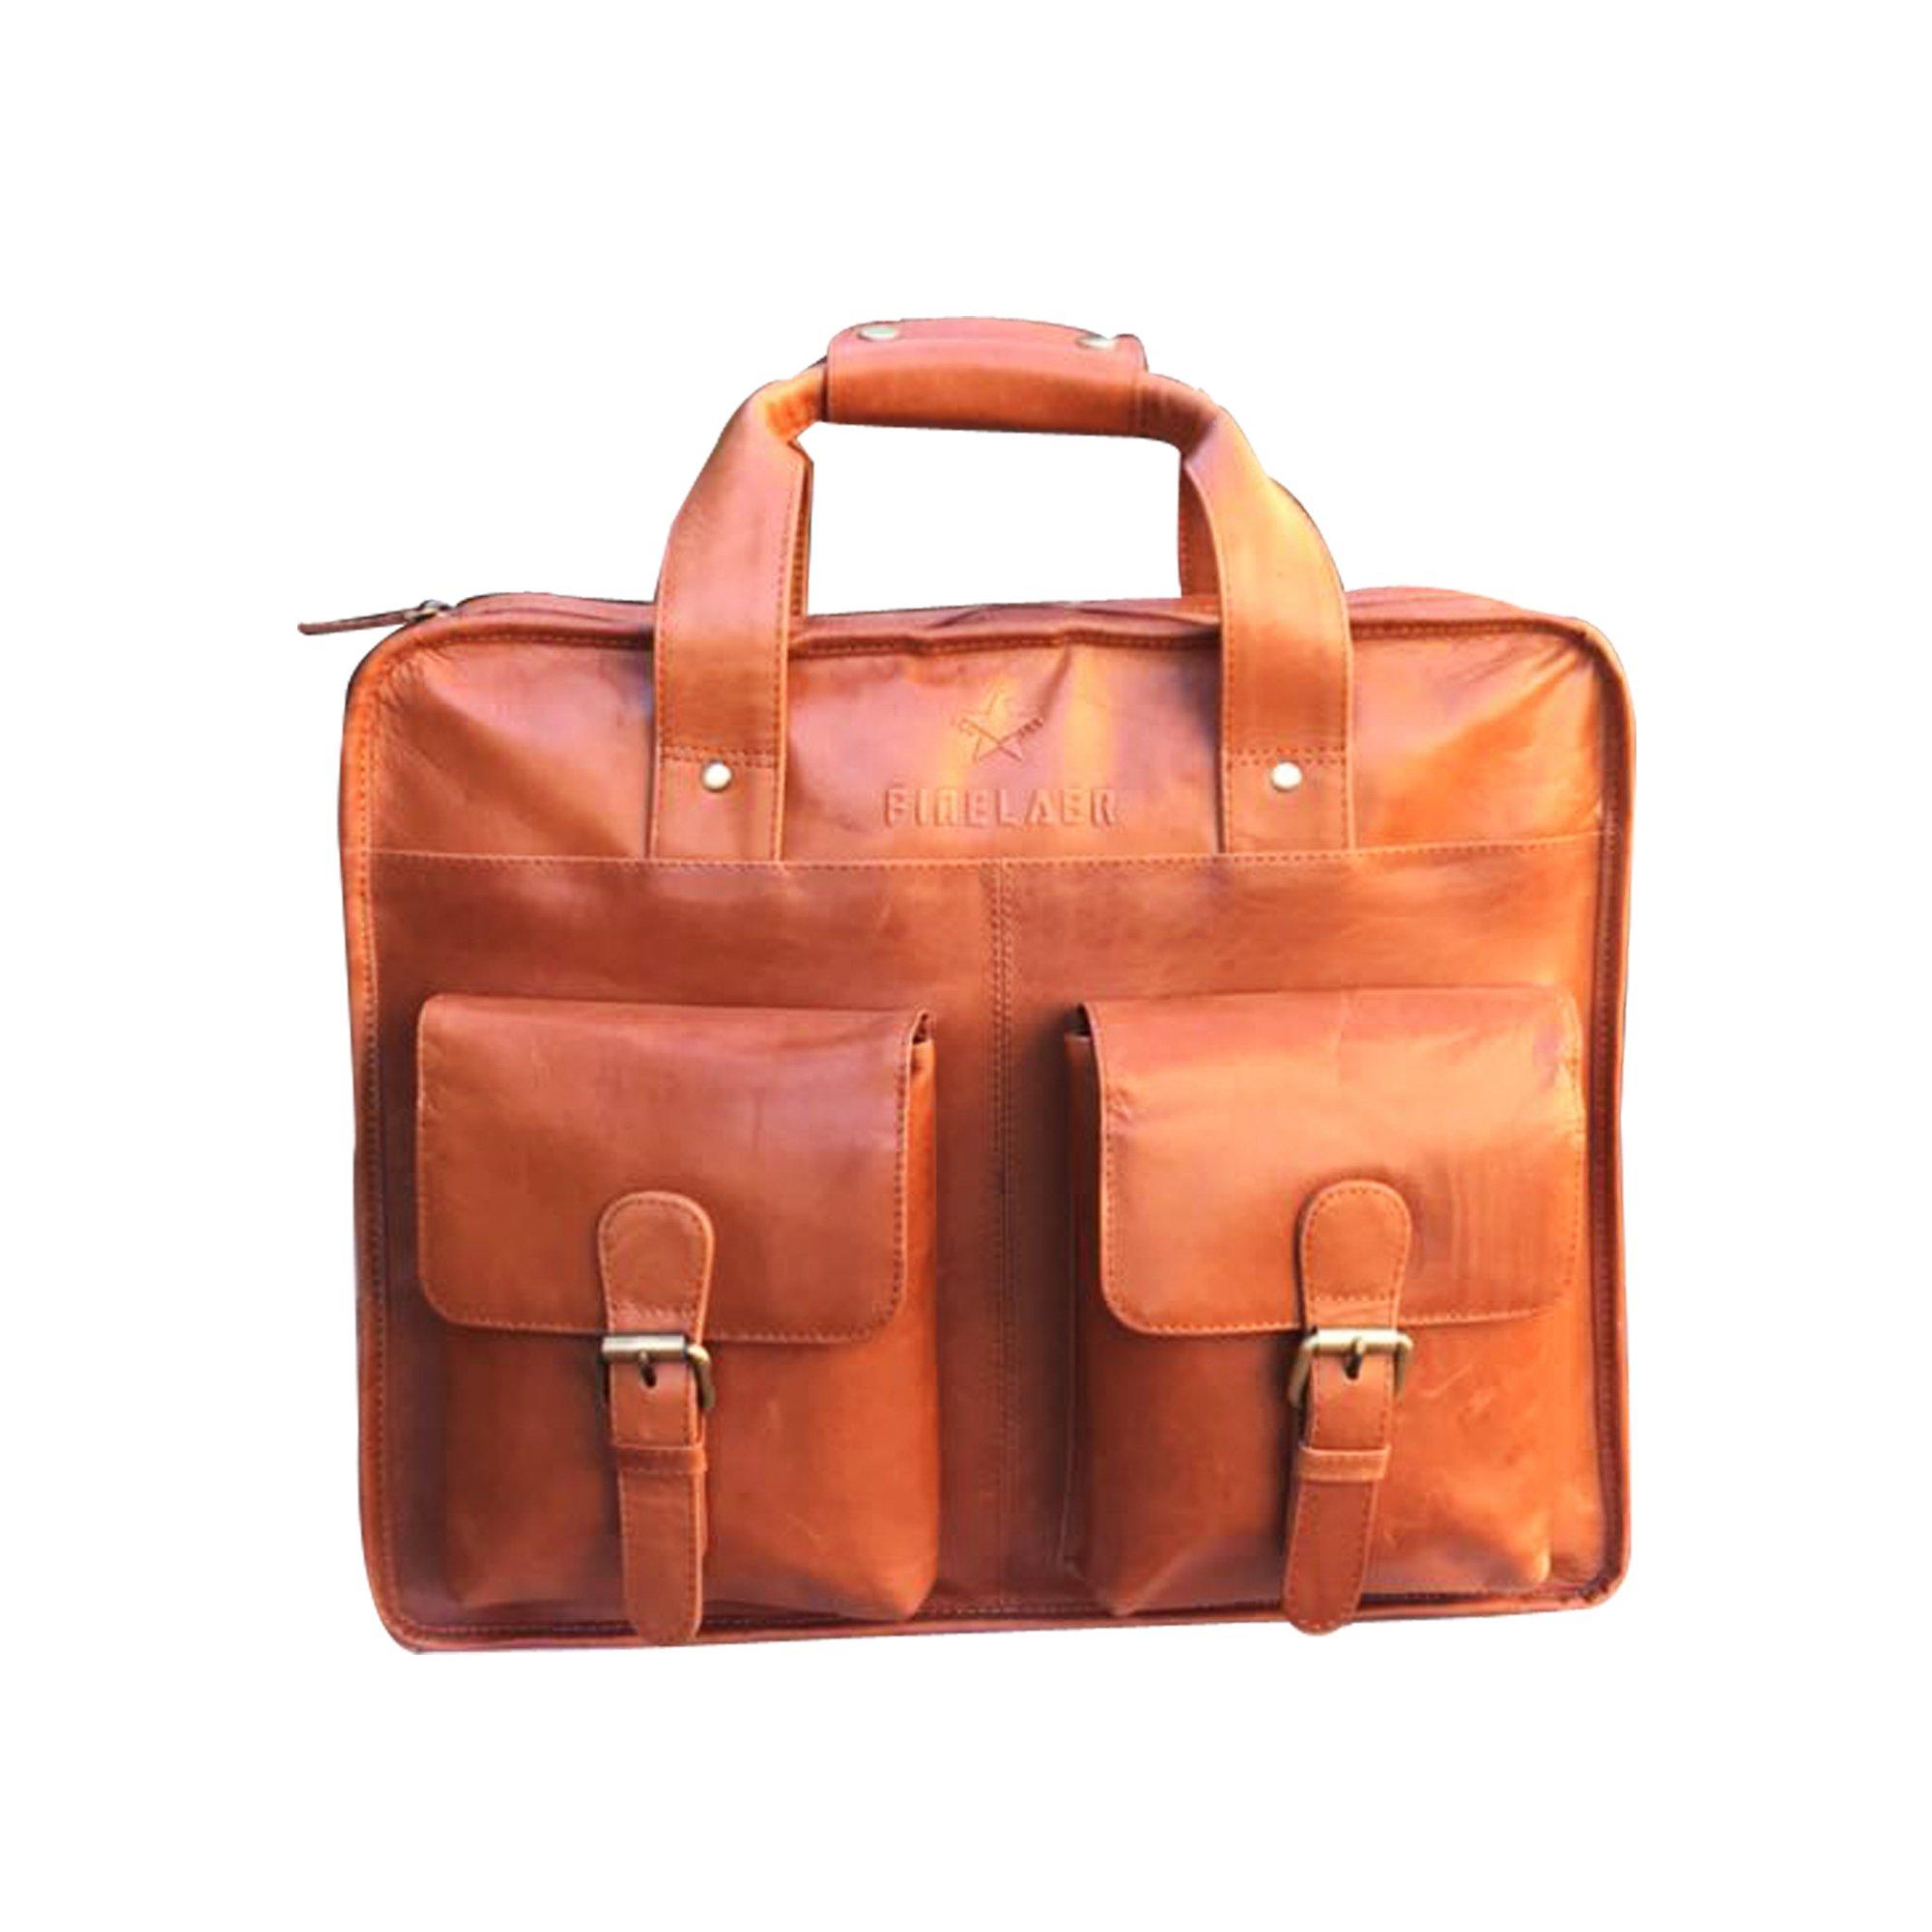 Finelaer Leather Laptop Computer Messenger Bag with Pockets for laptops Macbooks 14'' Brown